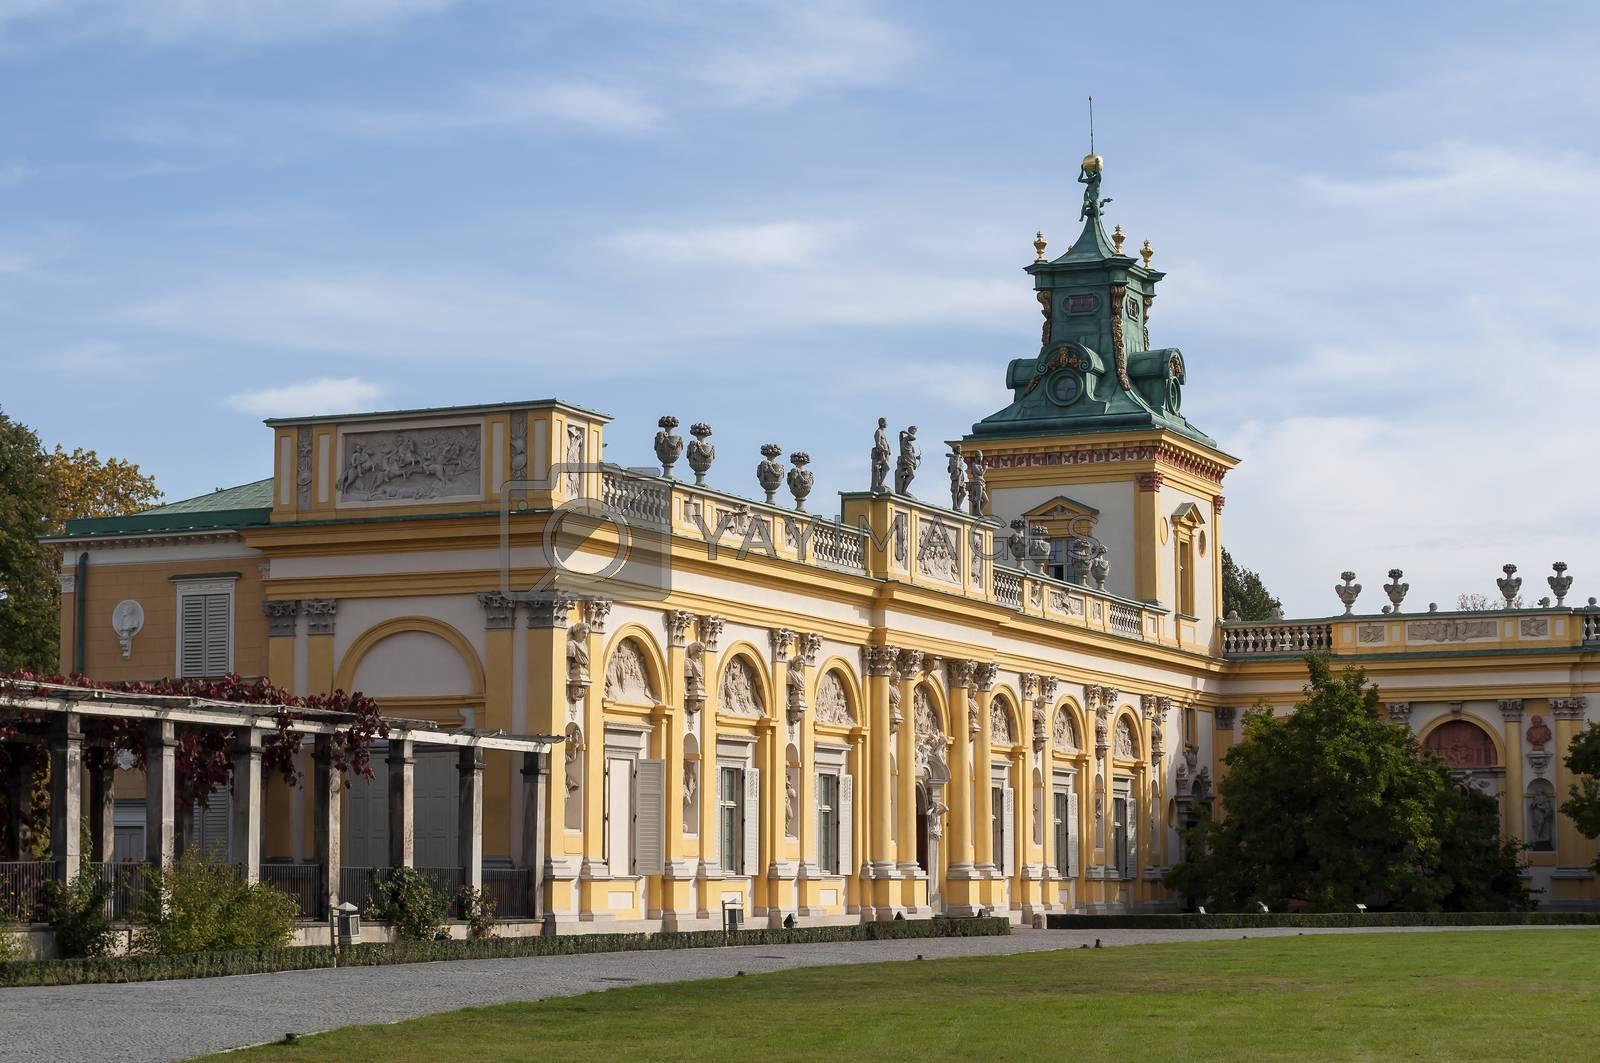 Royalty free image of Wilanow Palace, Warsaw, Poland. by FER737NG